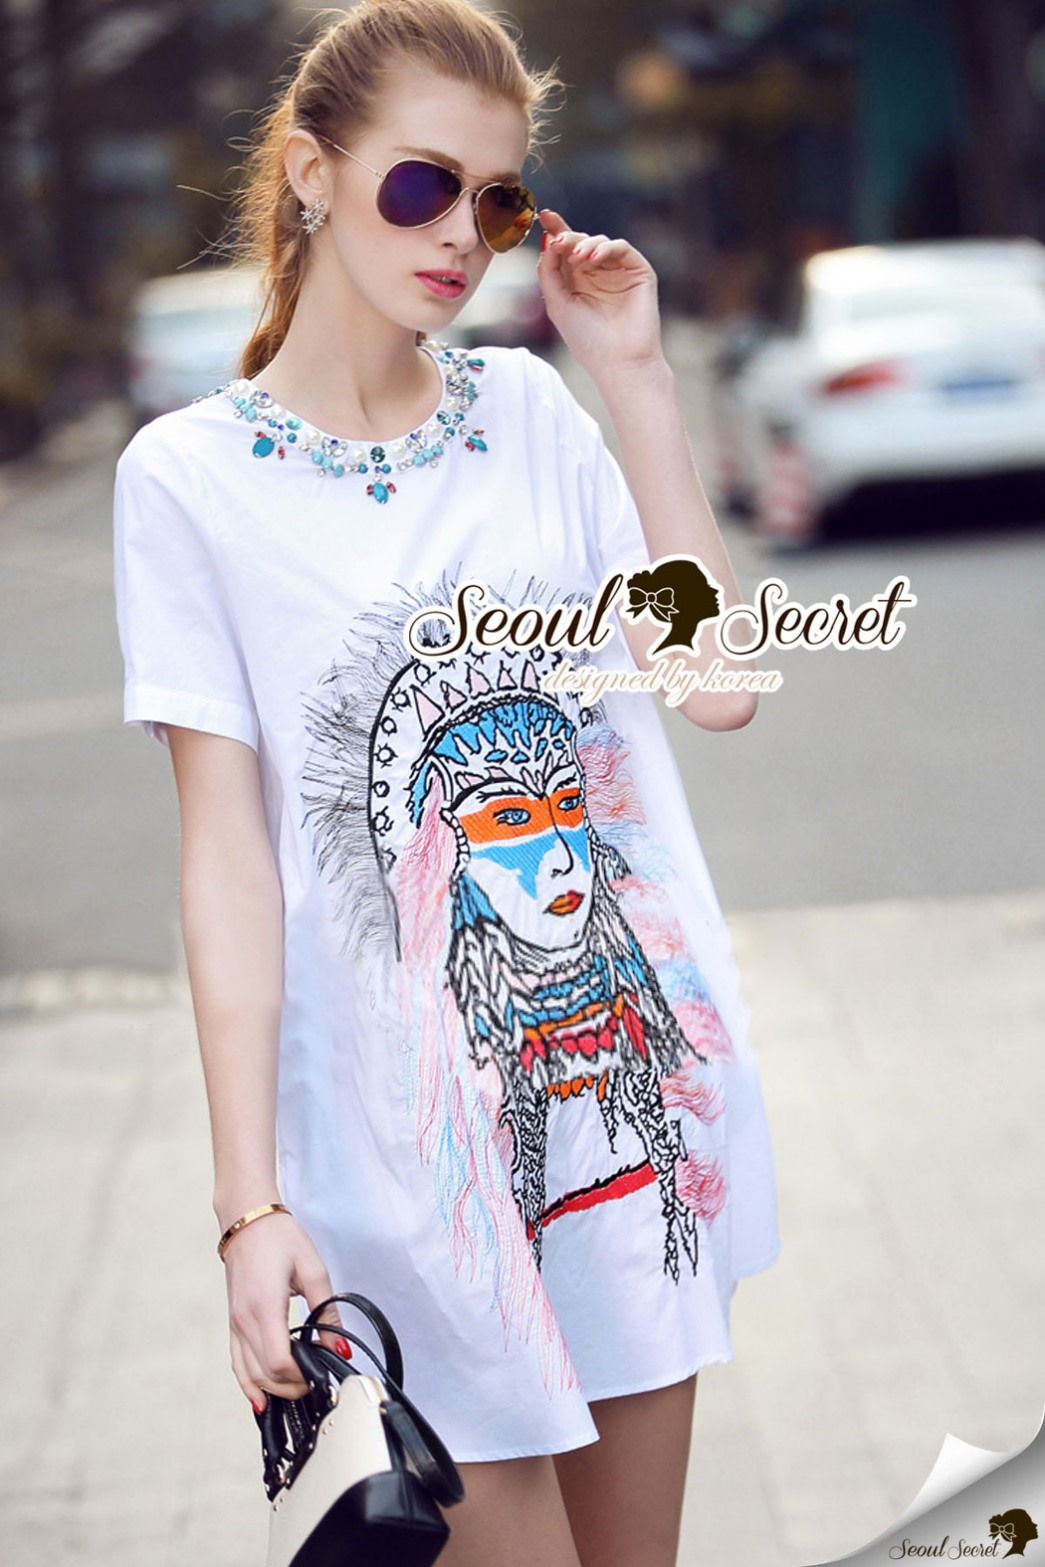 Seoul Secret Say's... Indiany Girly Gemmy Dress